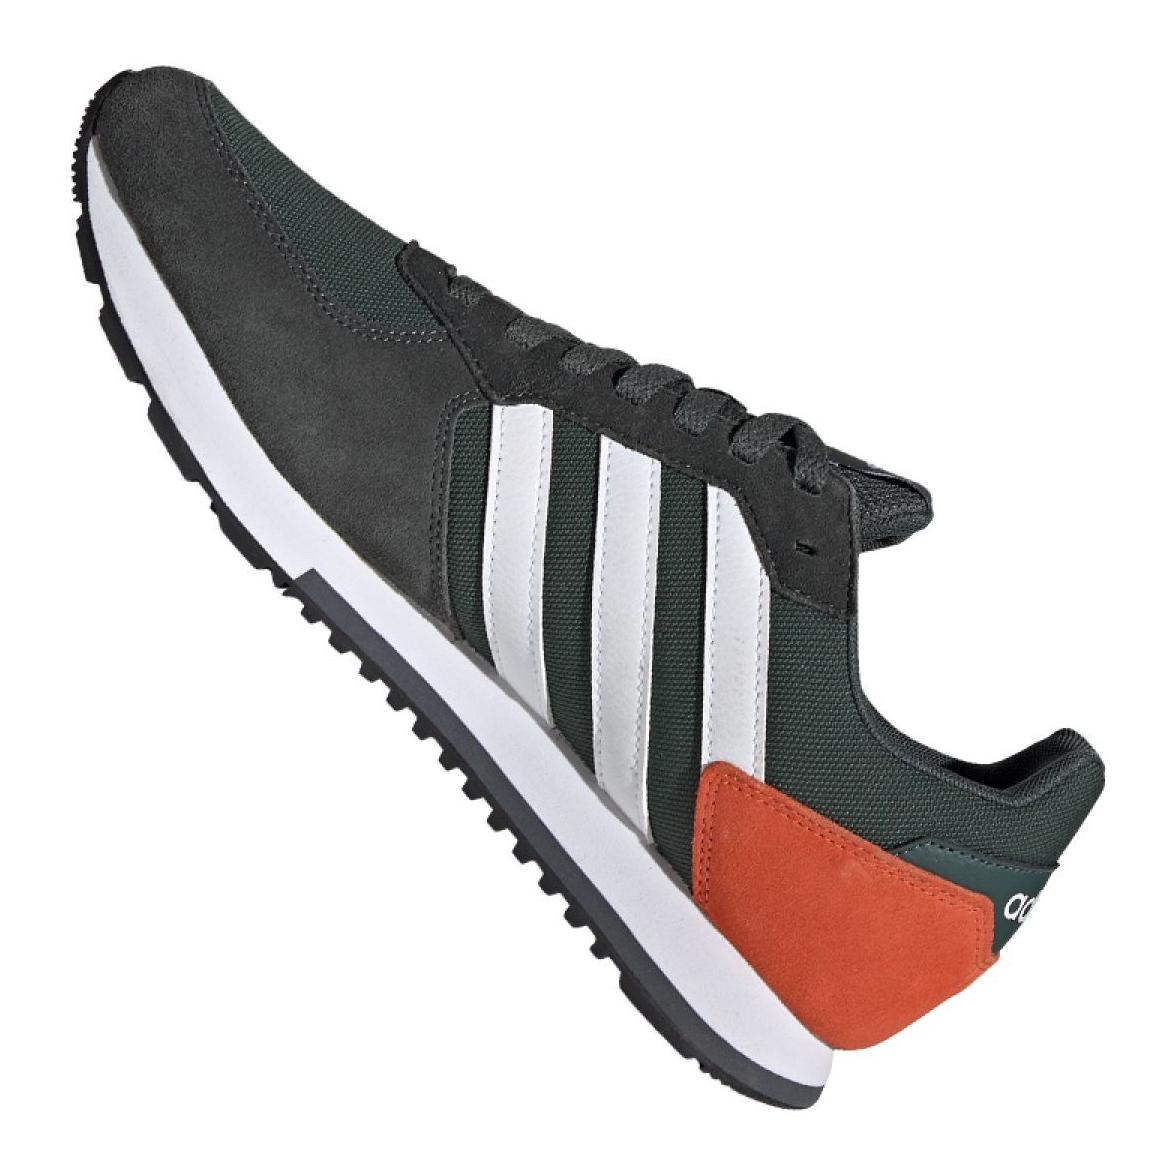 Adidas 8K M F34482 schoenen